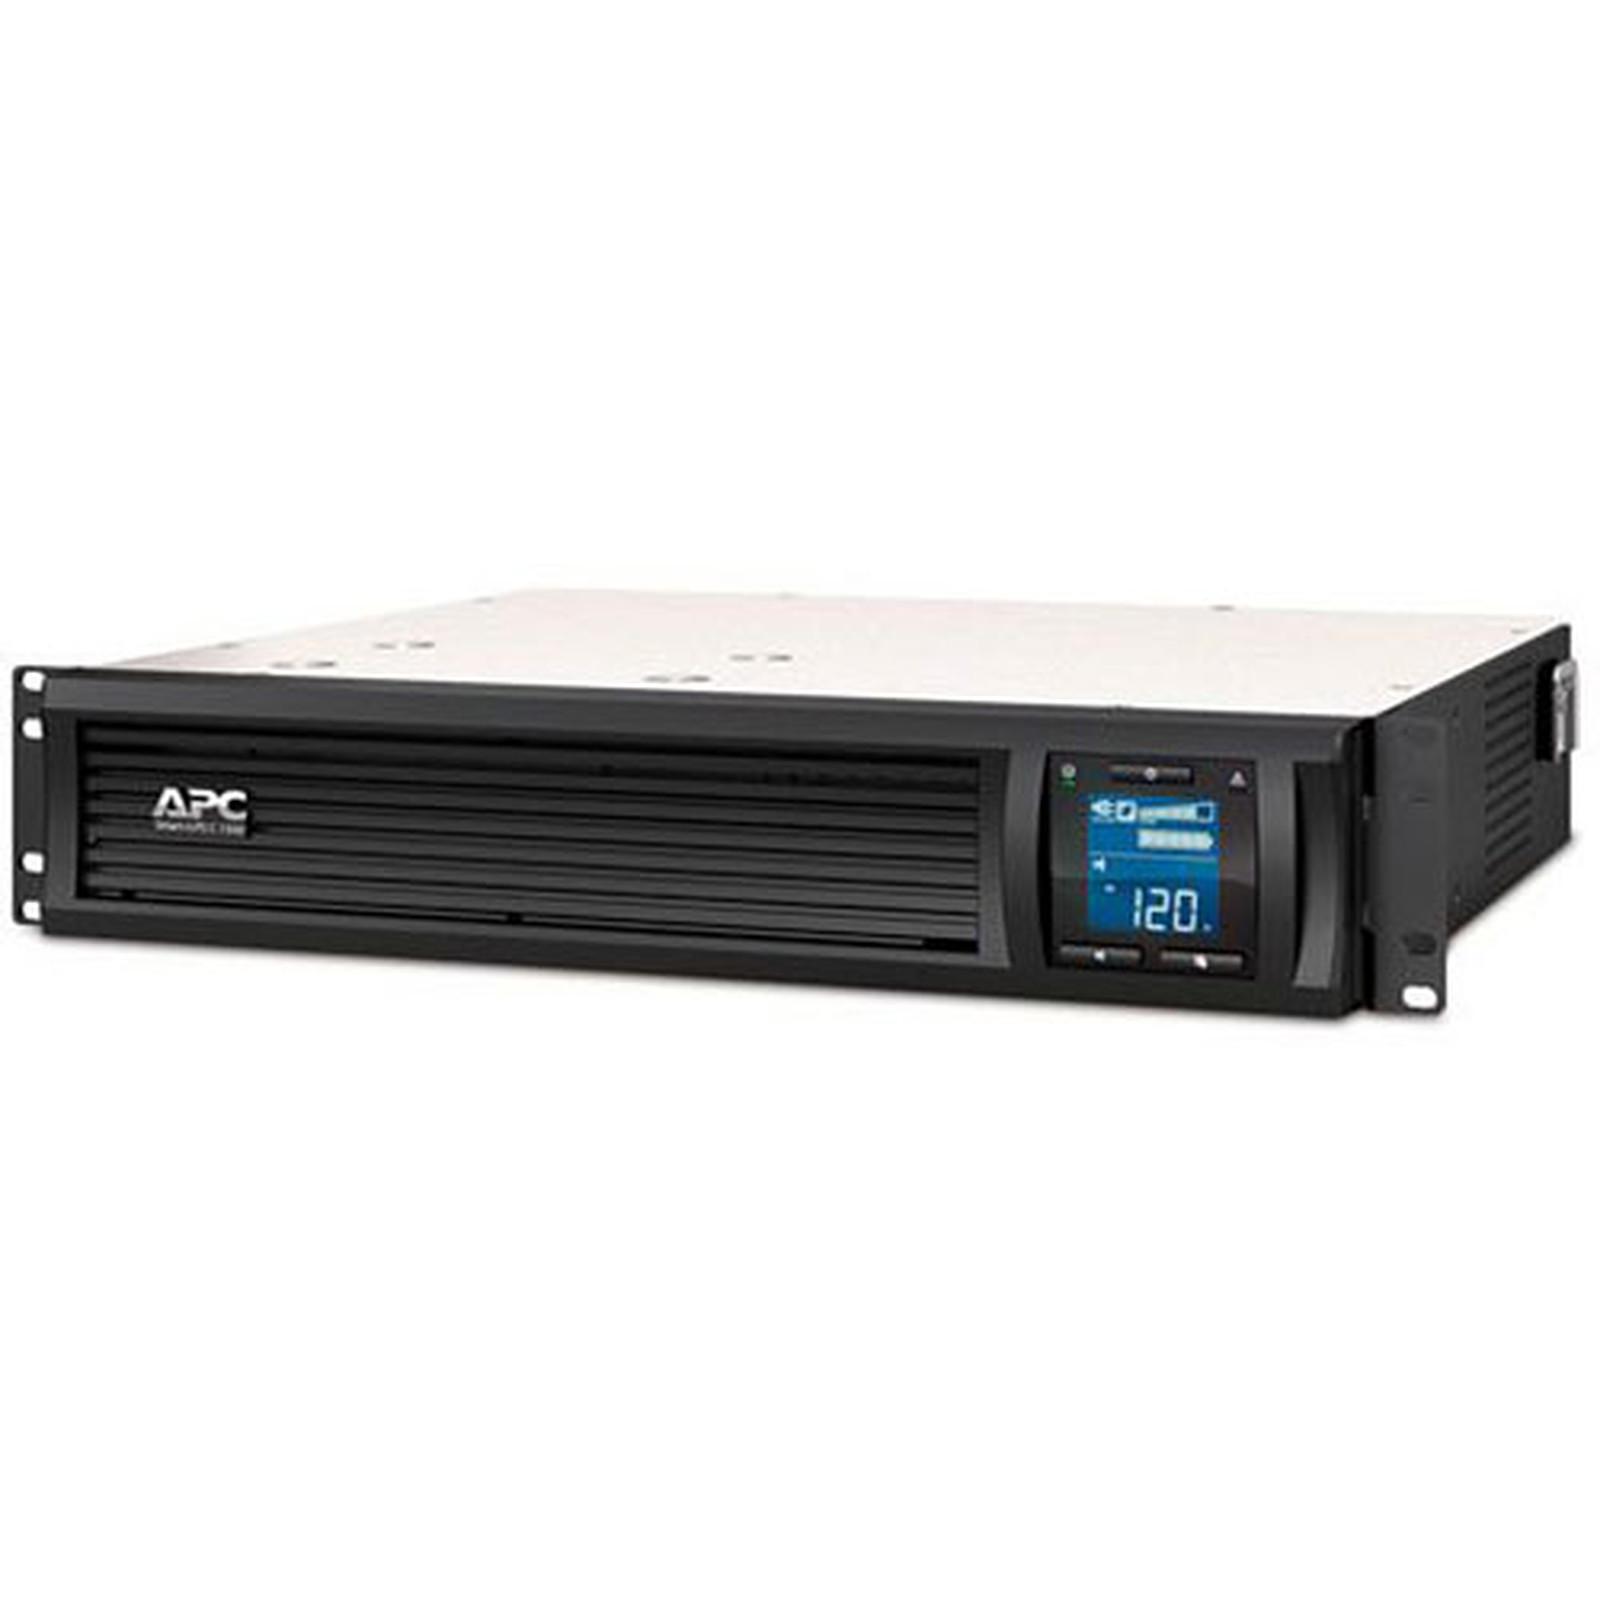 APC Smart-UPS SMC 1000 VA Rack